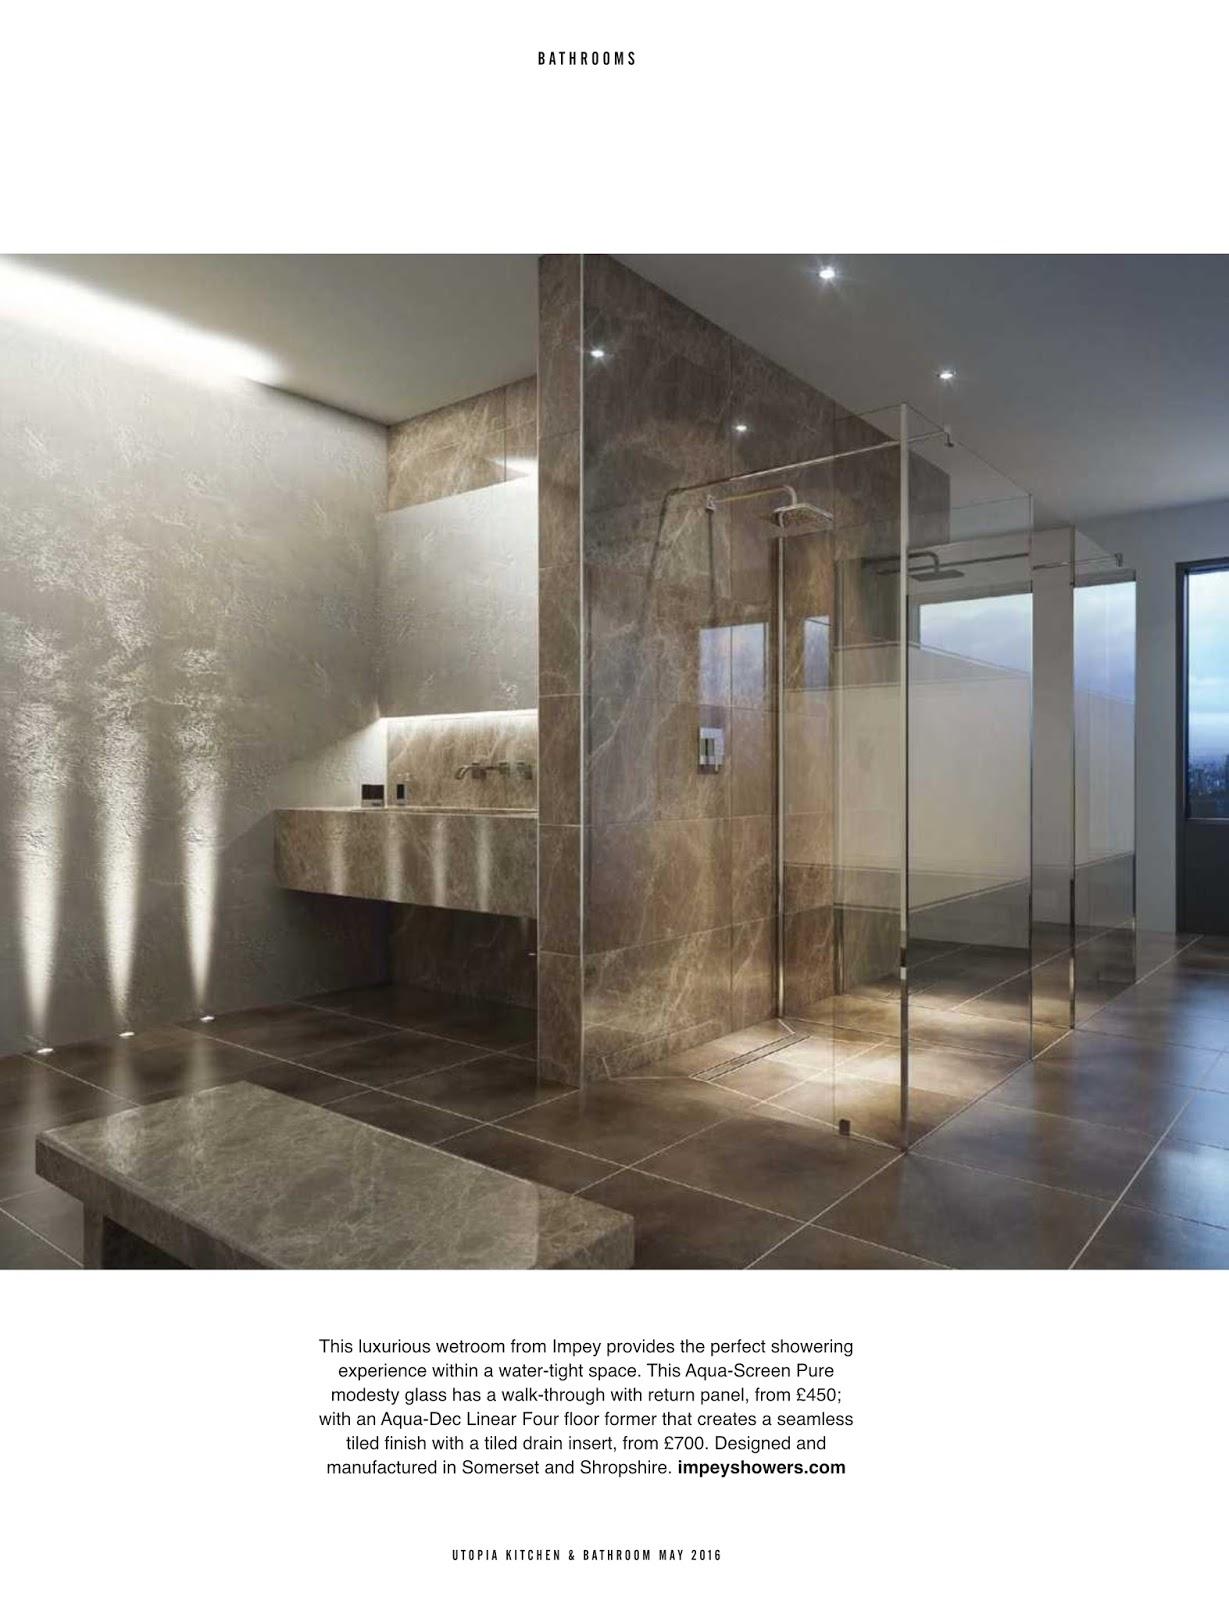 Bagi-Bagi Ajah: Utopia Kitchen & Bathroom - May 2016